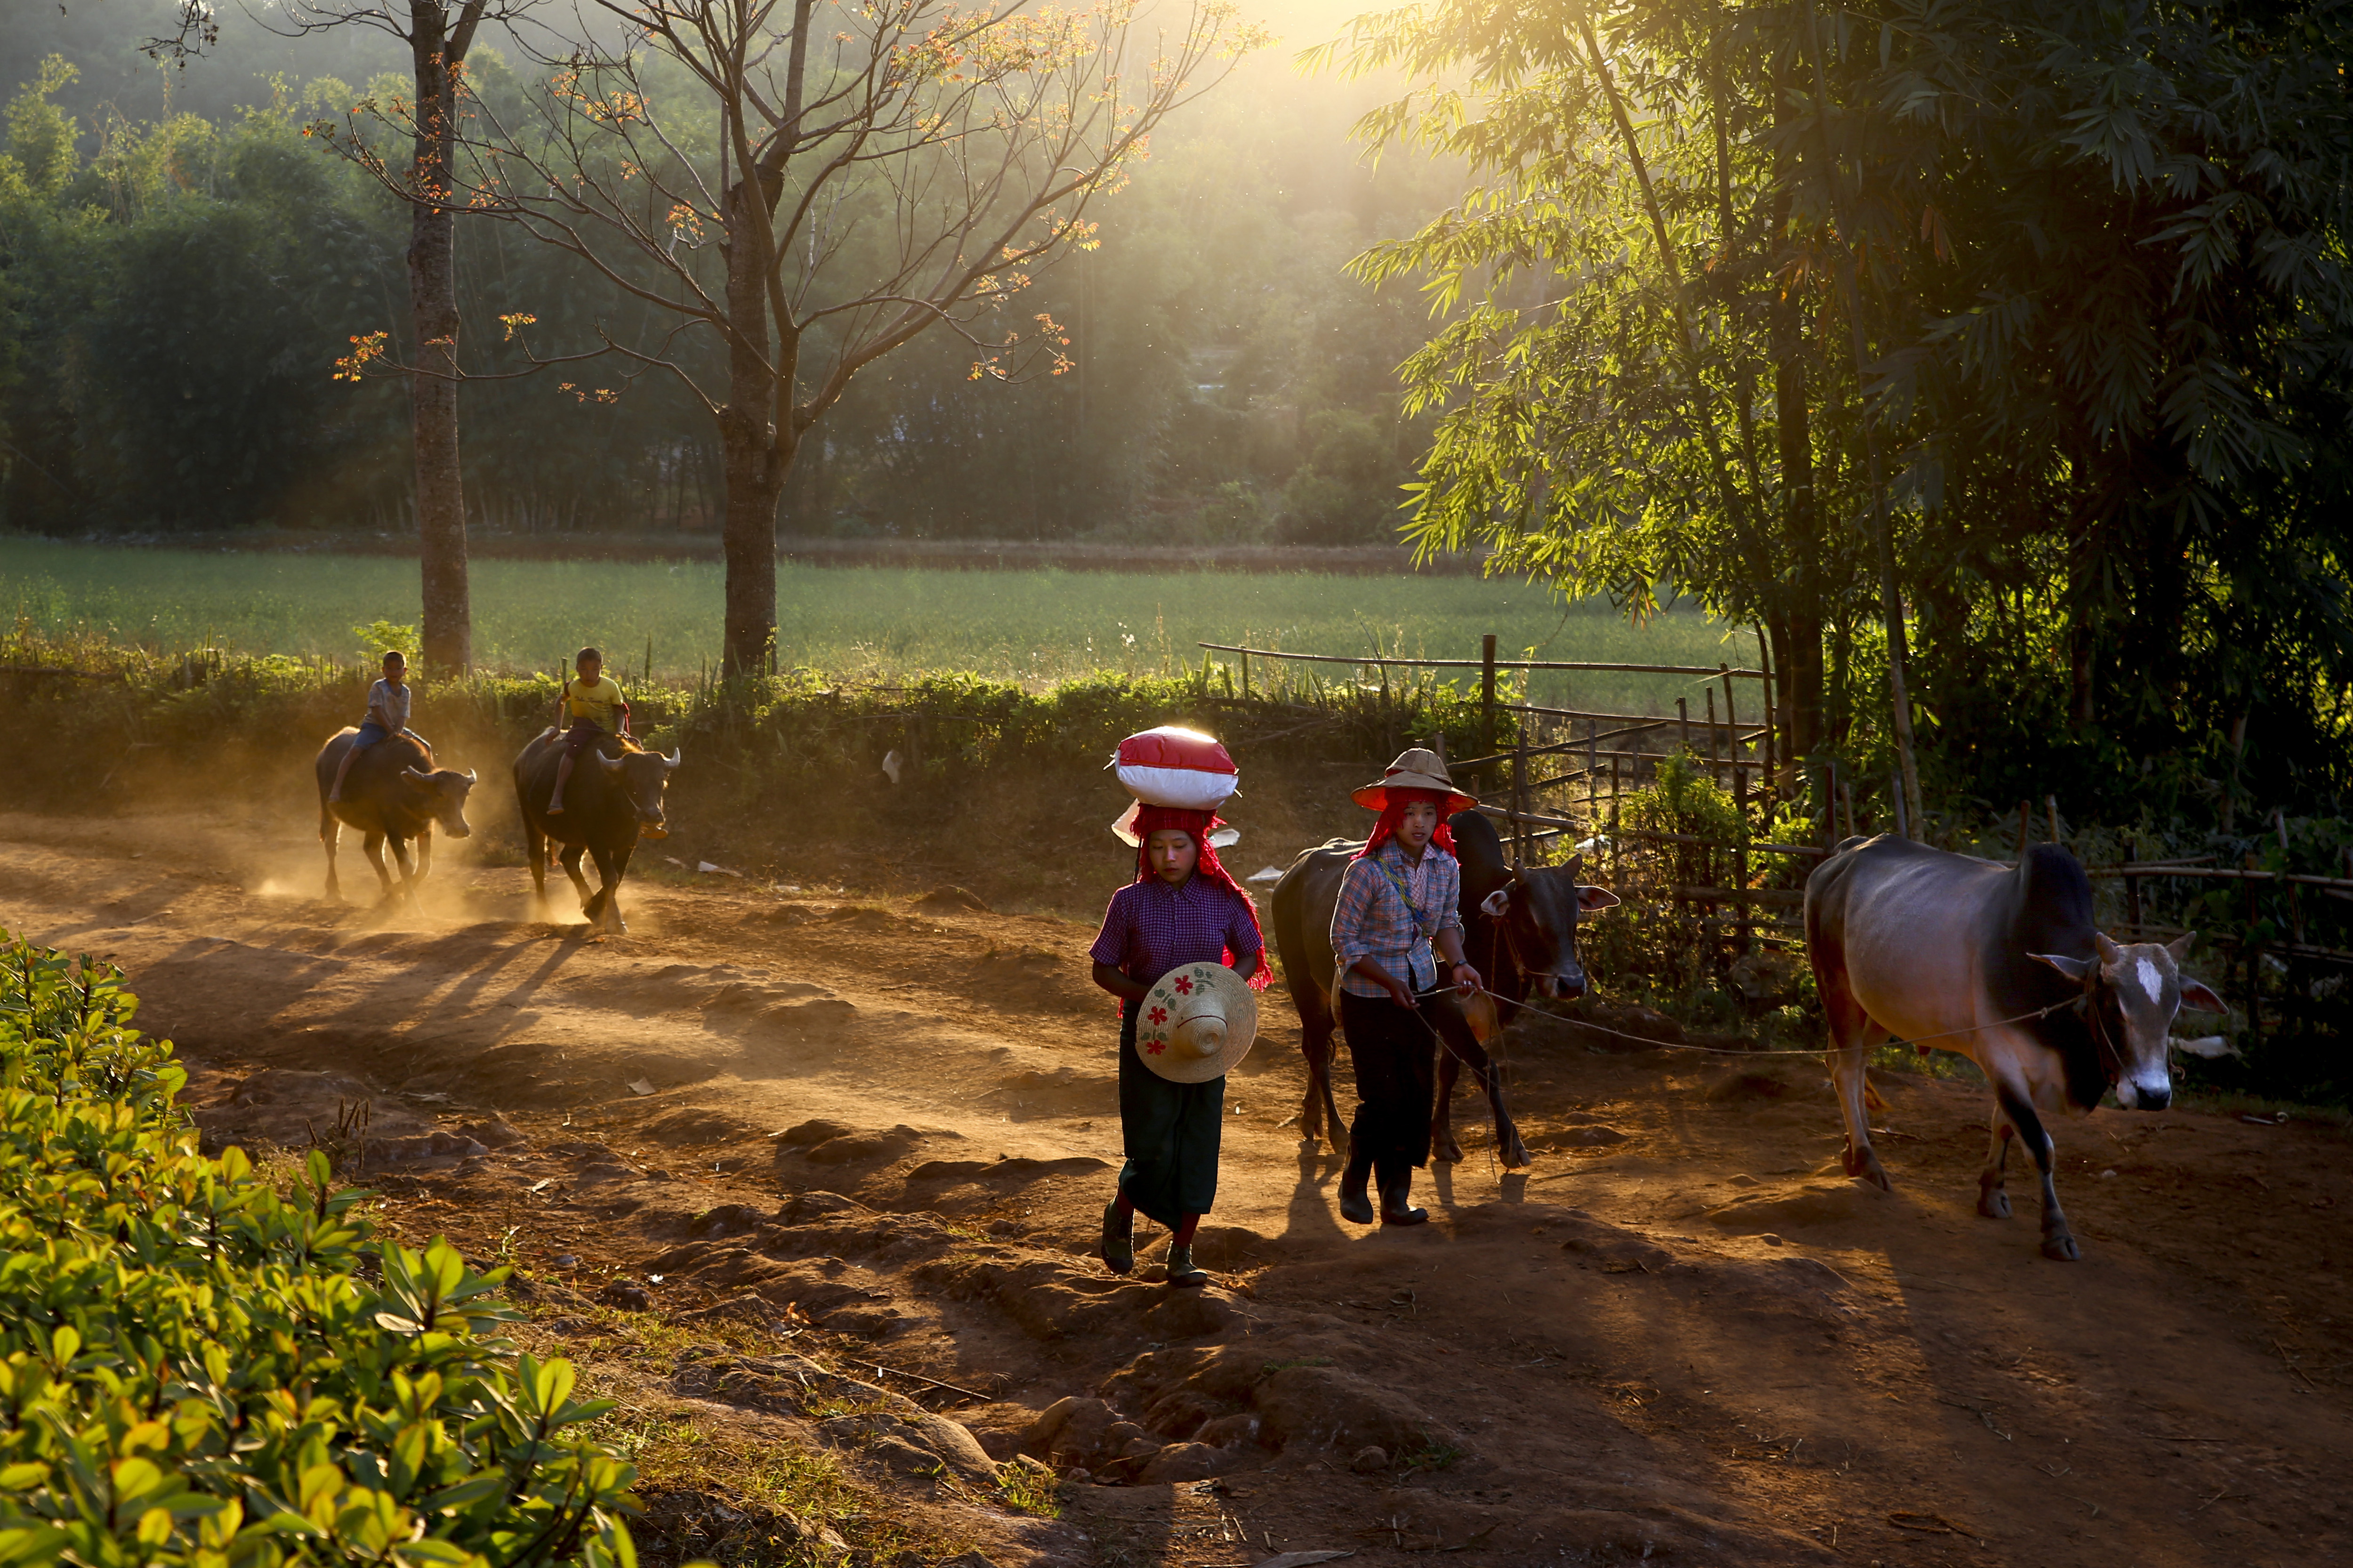 """Burmese day"", επιλέχθηκε ως φωτογραφία της ημέρας στο National Geographic"